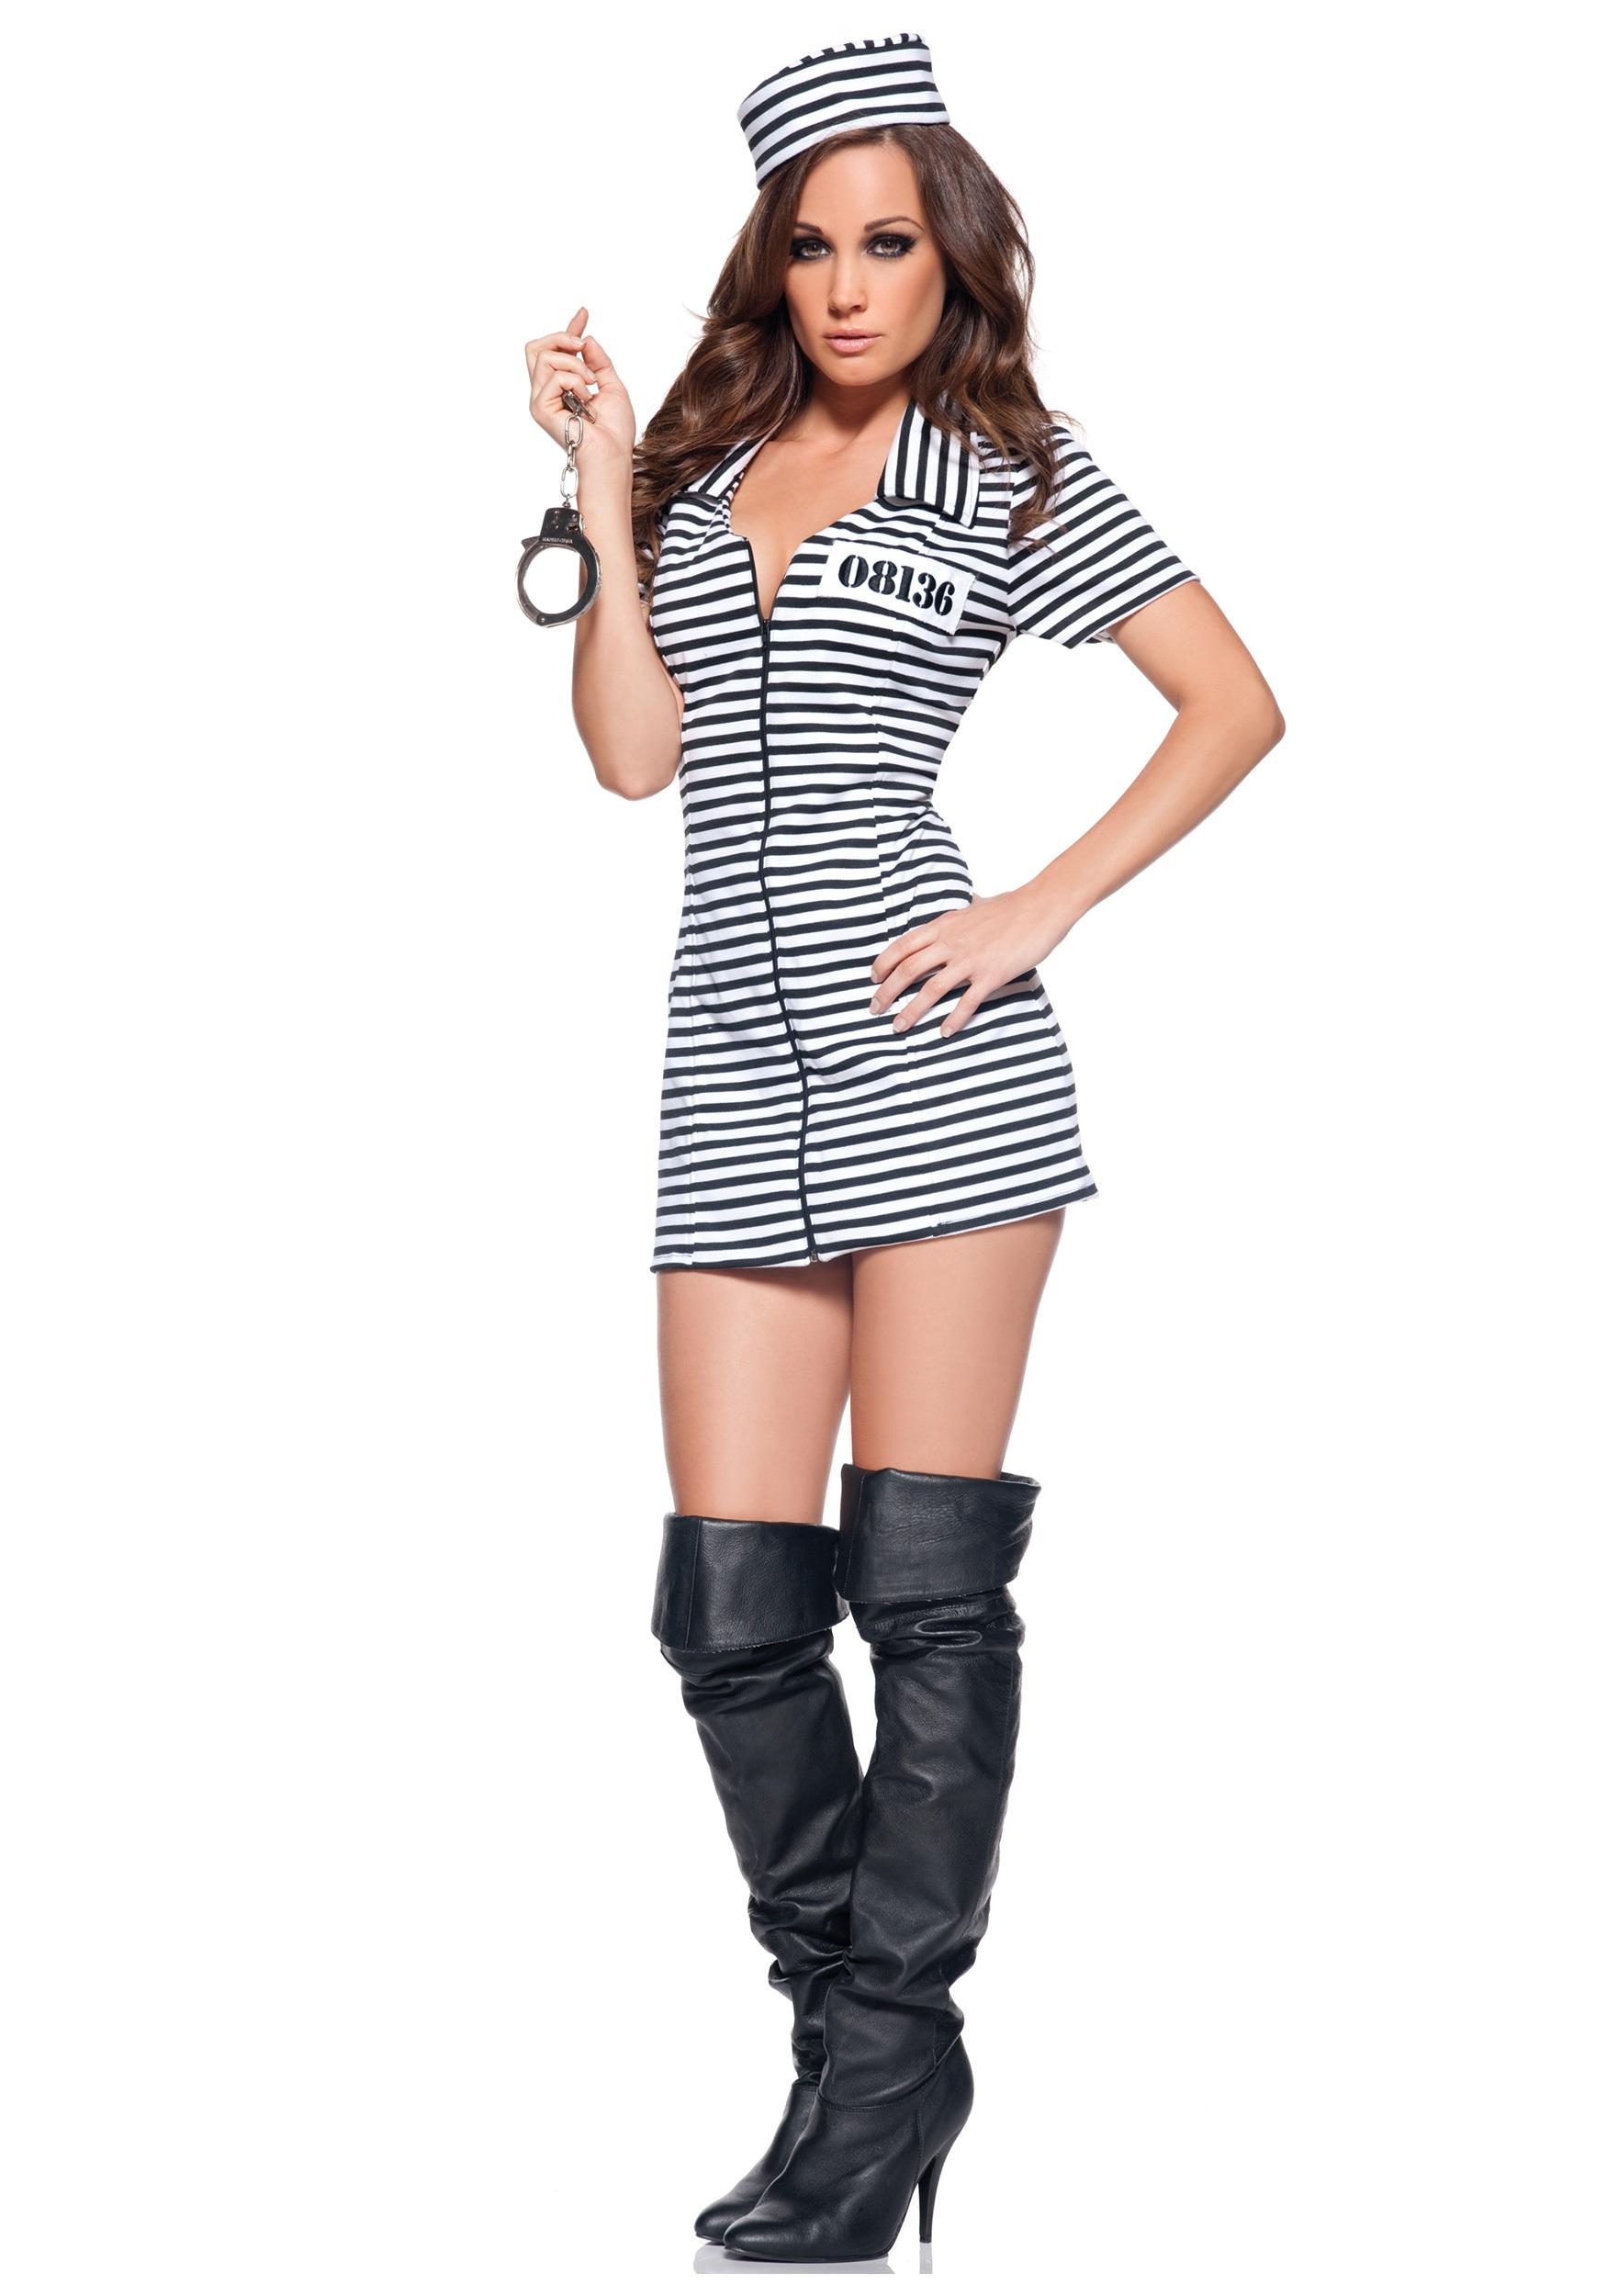 Miss Behaved Convict Costume  sc 1 st  Halloween Costume & Miss Behaved Convict Costume - Ladies Prisoner Costume Ideas